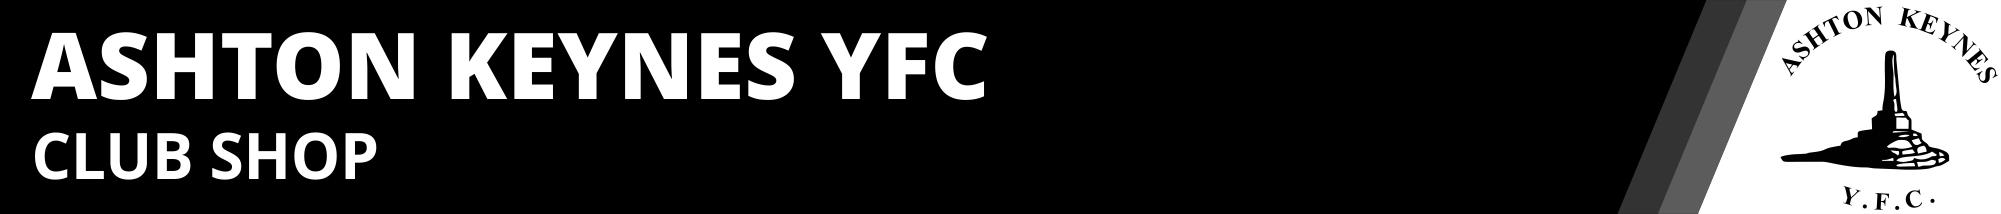 ashton-keynes-yfc-club-shop-banner.png